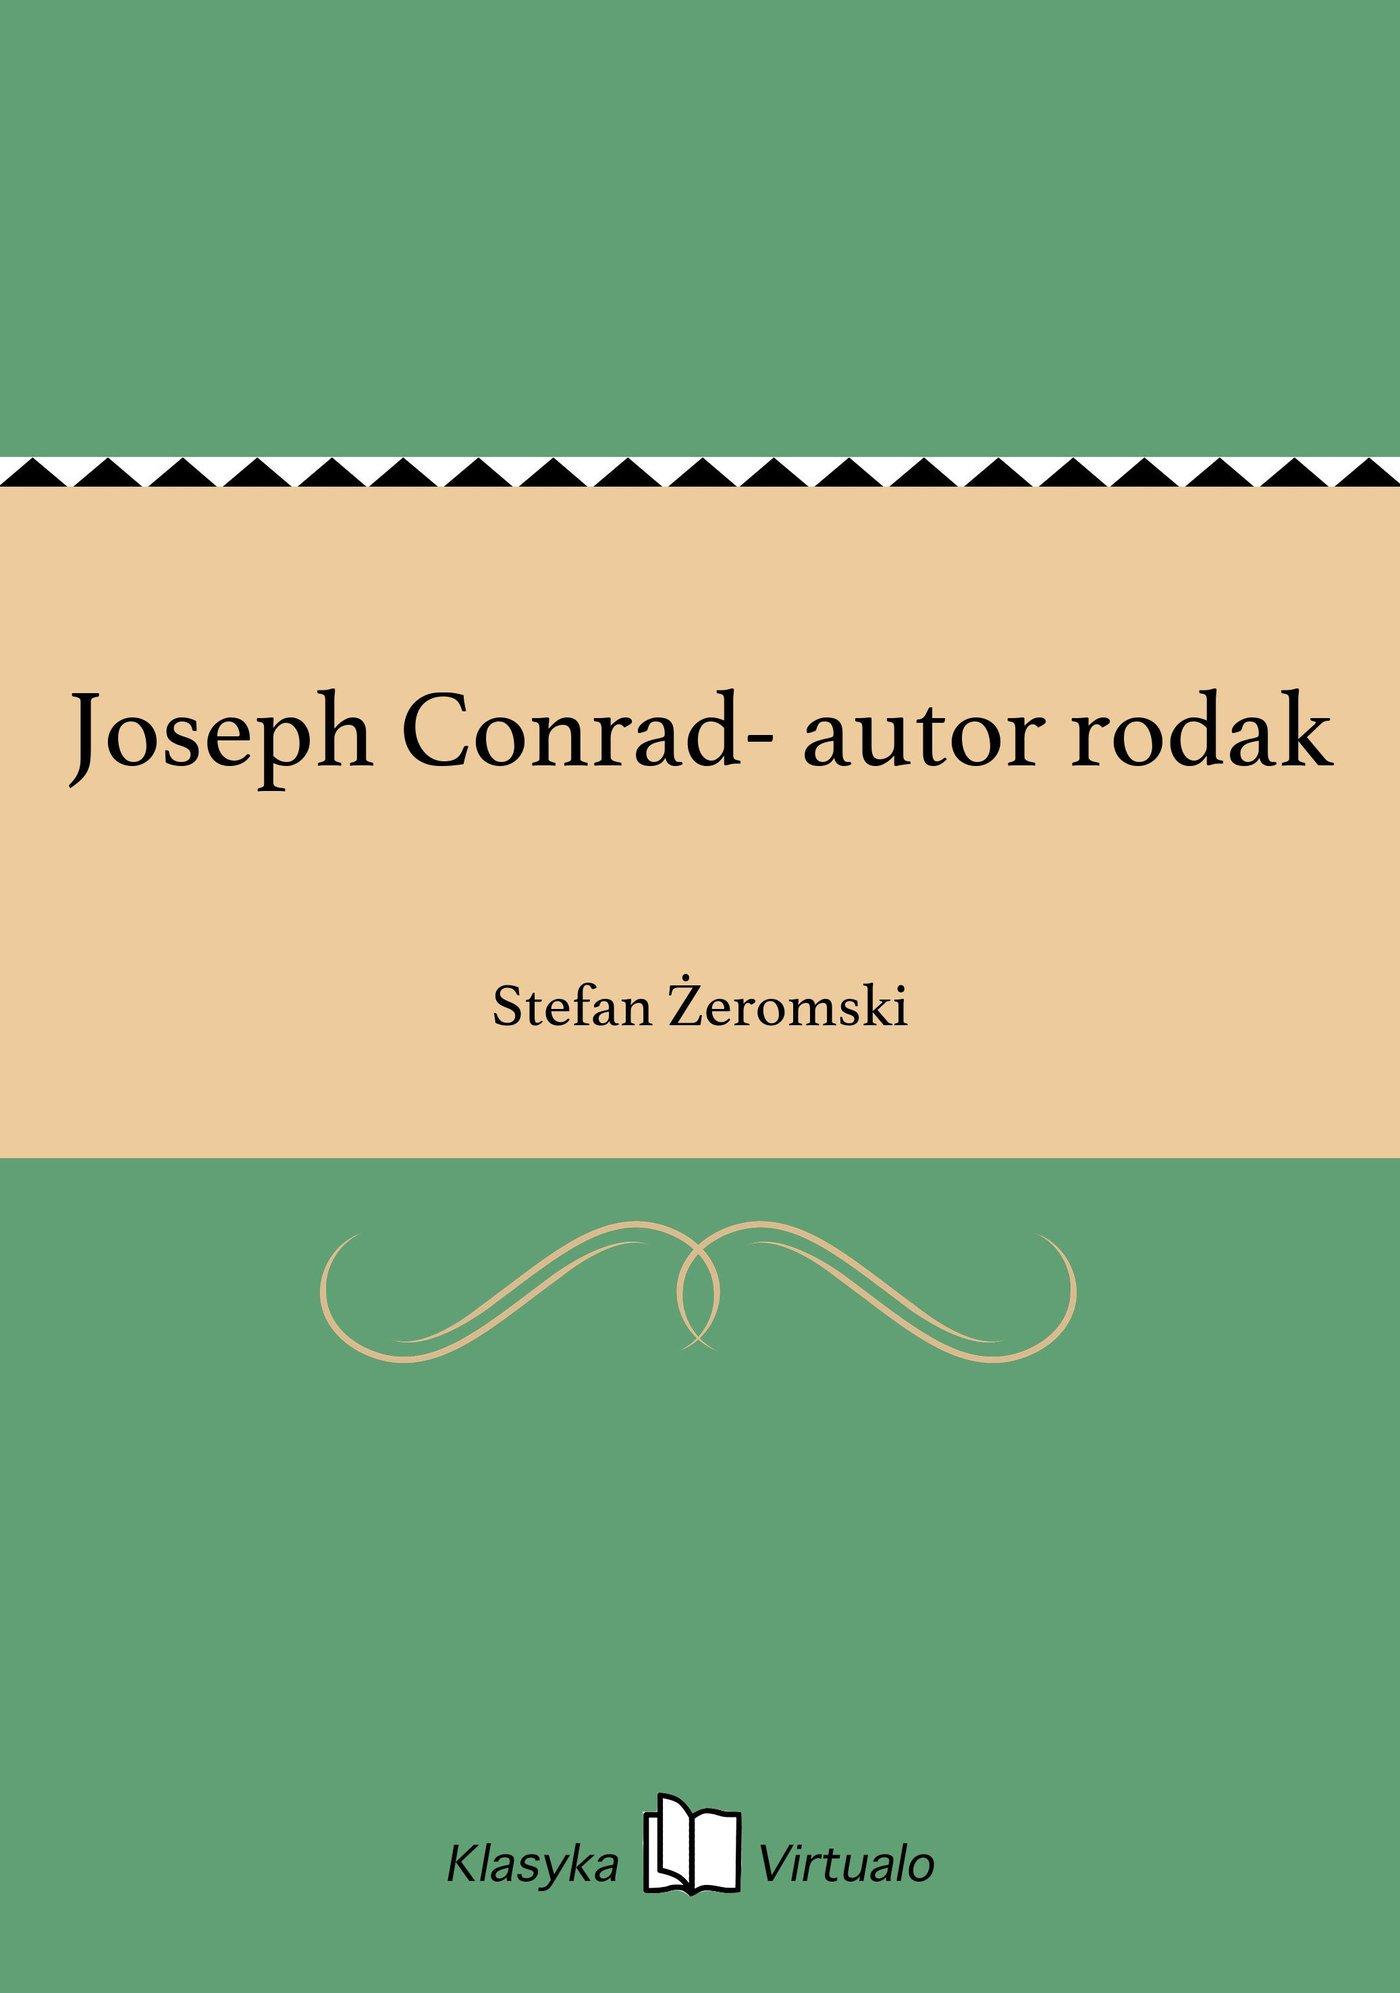 Joseph Conrad- autor rodak - Ebook (Książka na Kindle) do pobrania w formacie MOBI